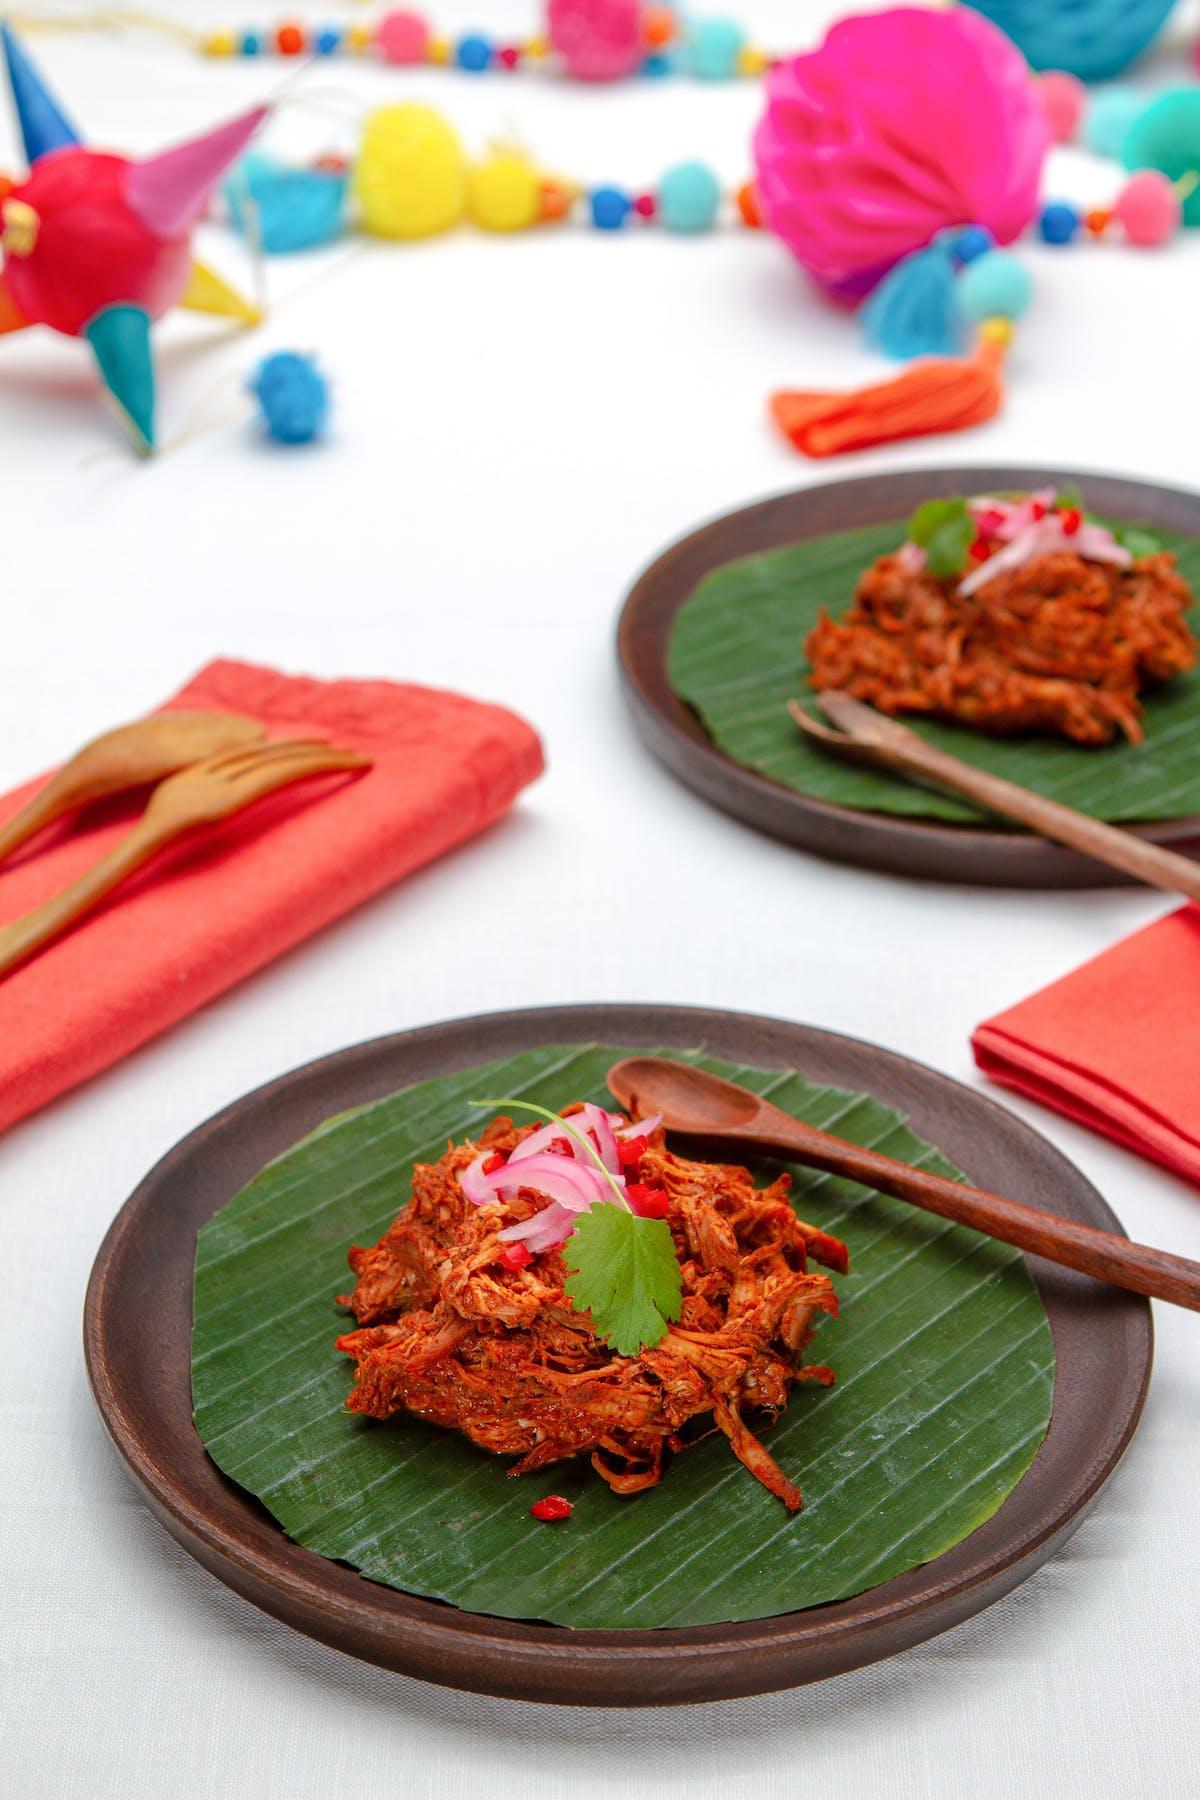 Slow cooker Mexican Cochinita Pibil